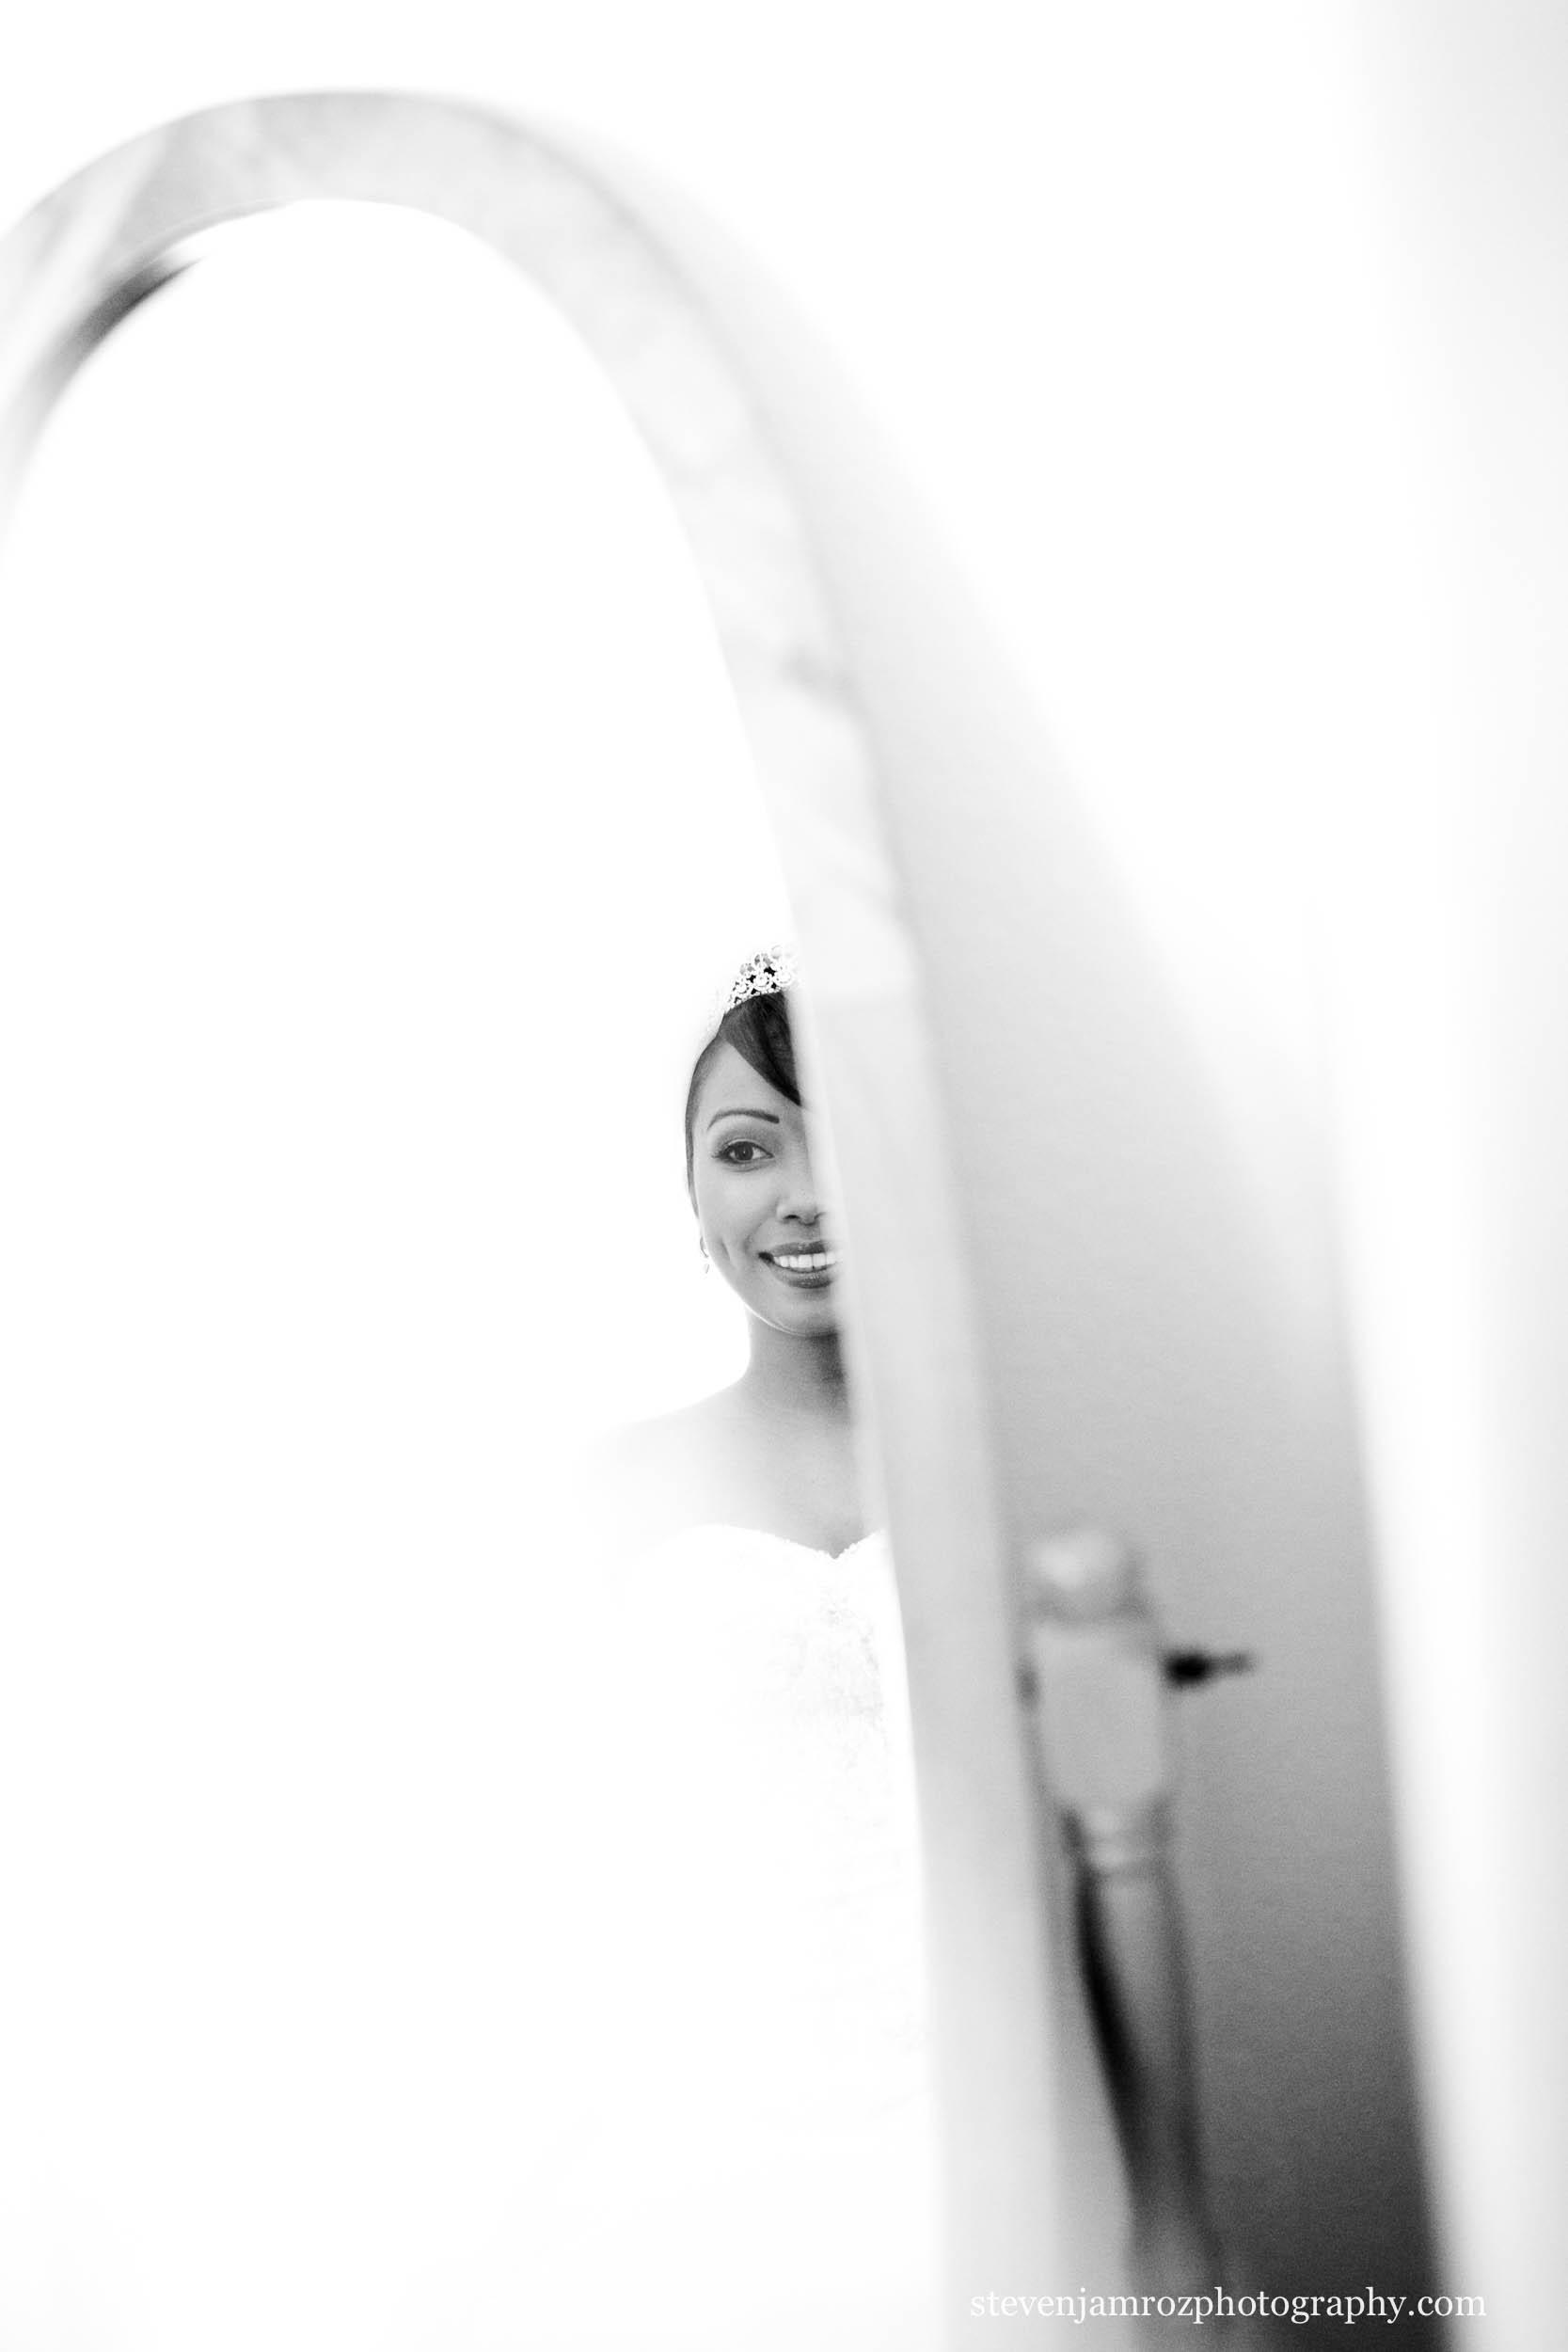 bride-in-mirror-raleigh-nc-steven-jamroz-photography-0189.jpg